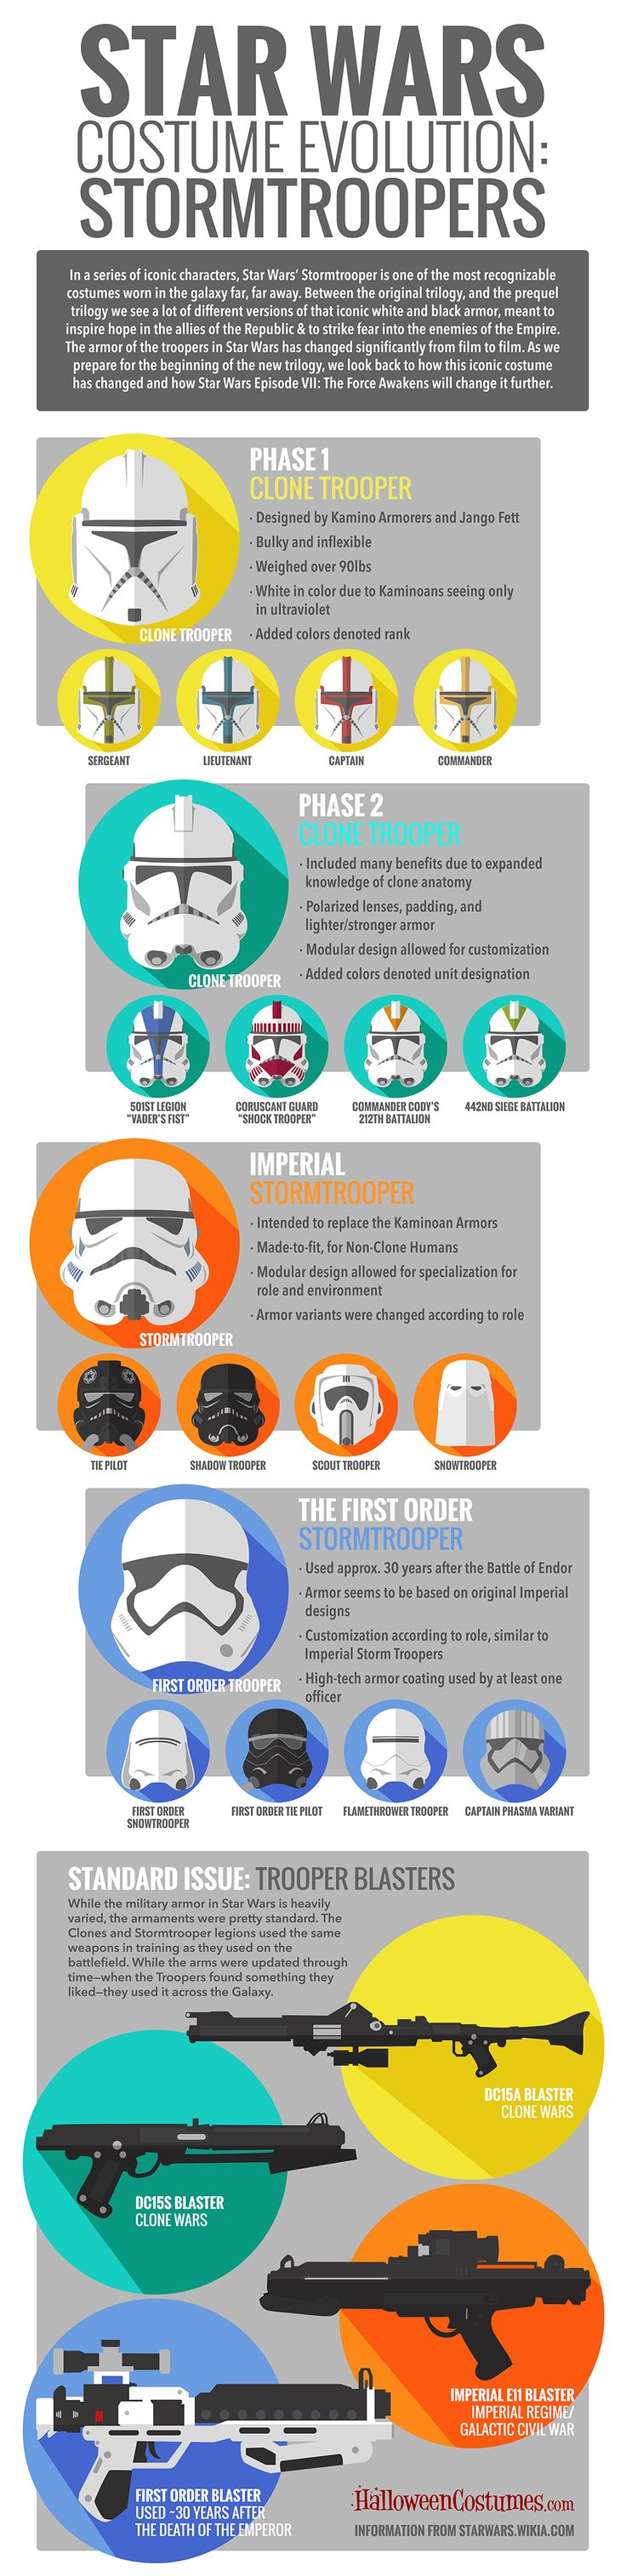 Star Wars Costume Evolution Stormtrooper #infographic #StarWars #Entertainment